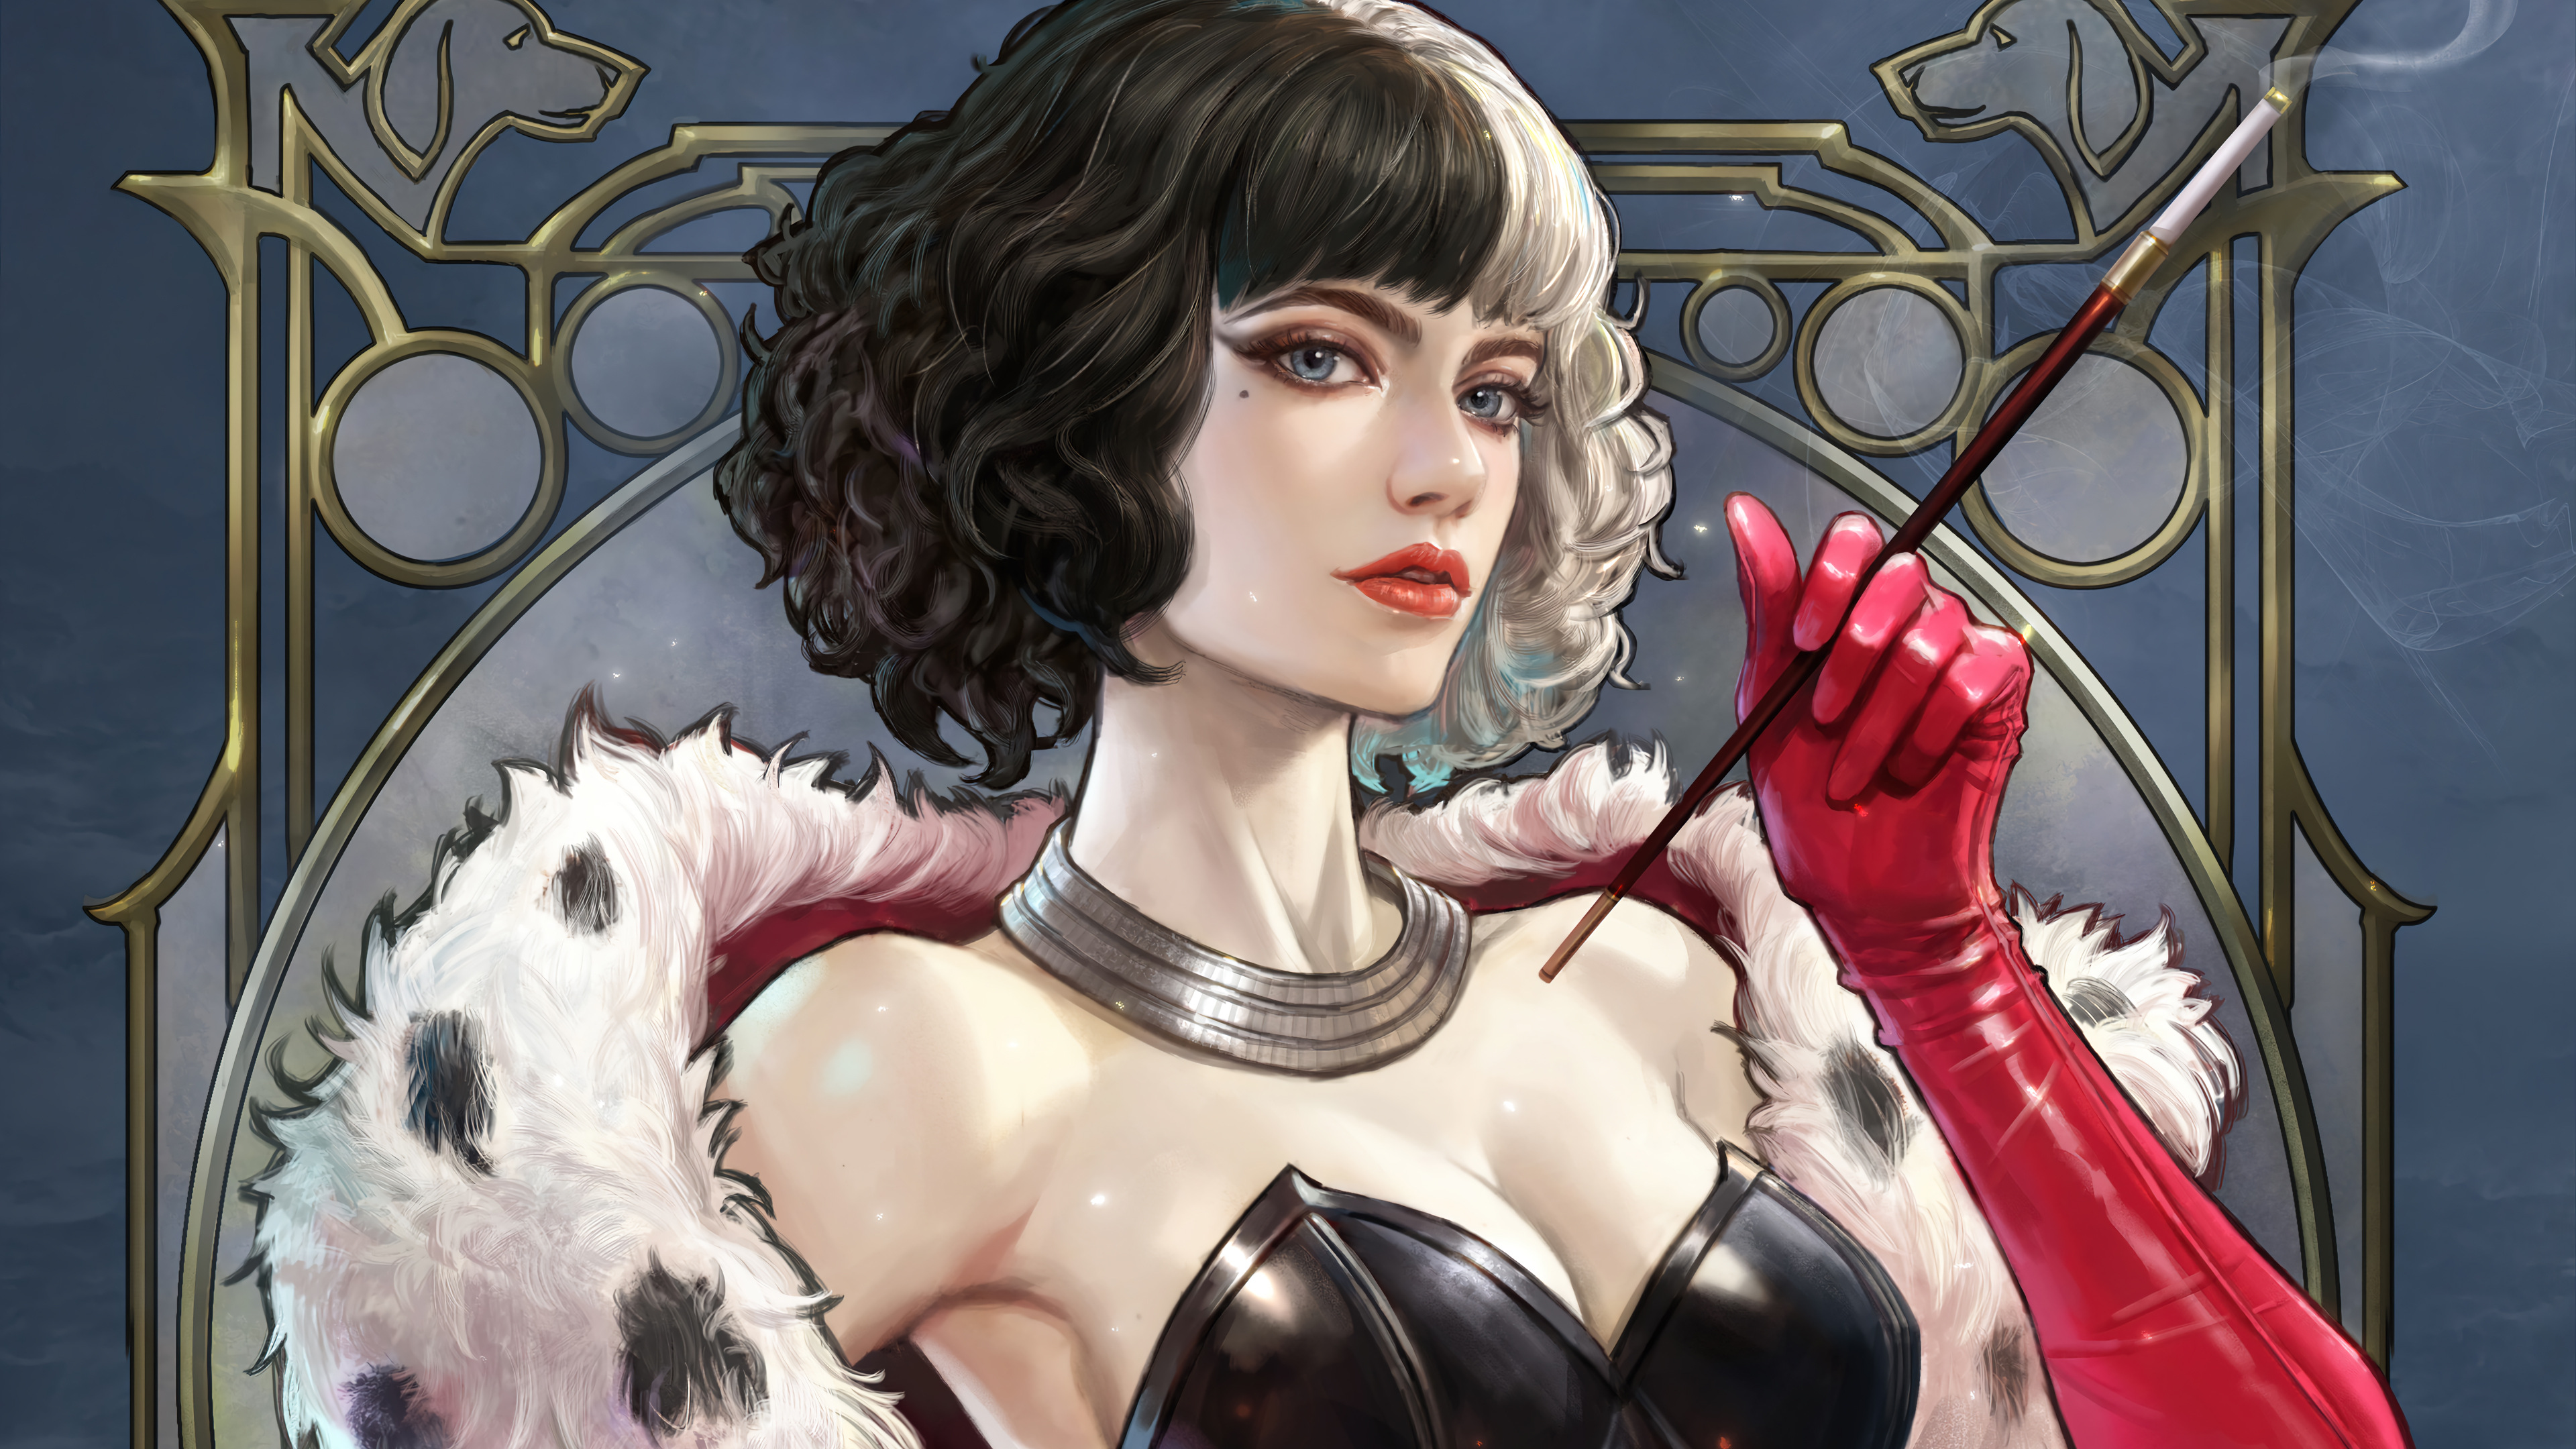 Fondos de pantalla Fanart de Emma Stone como Cruella